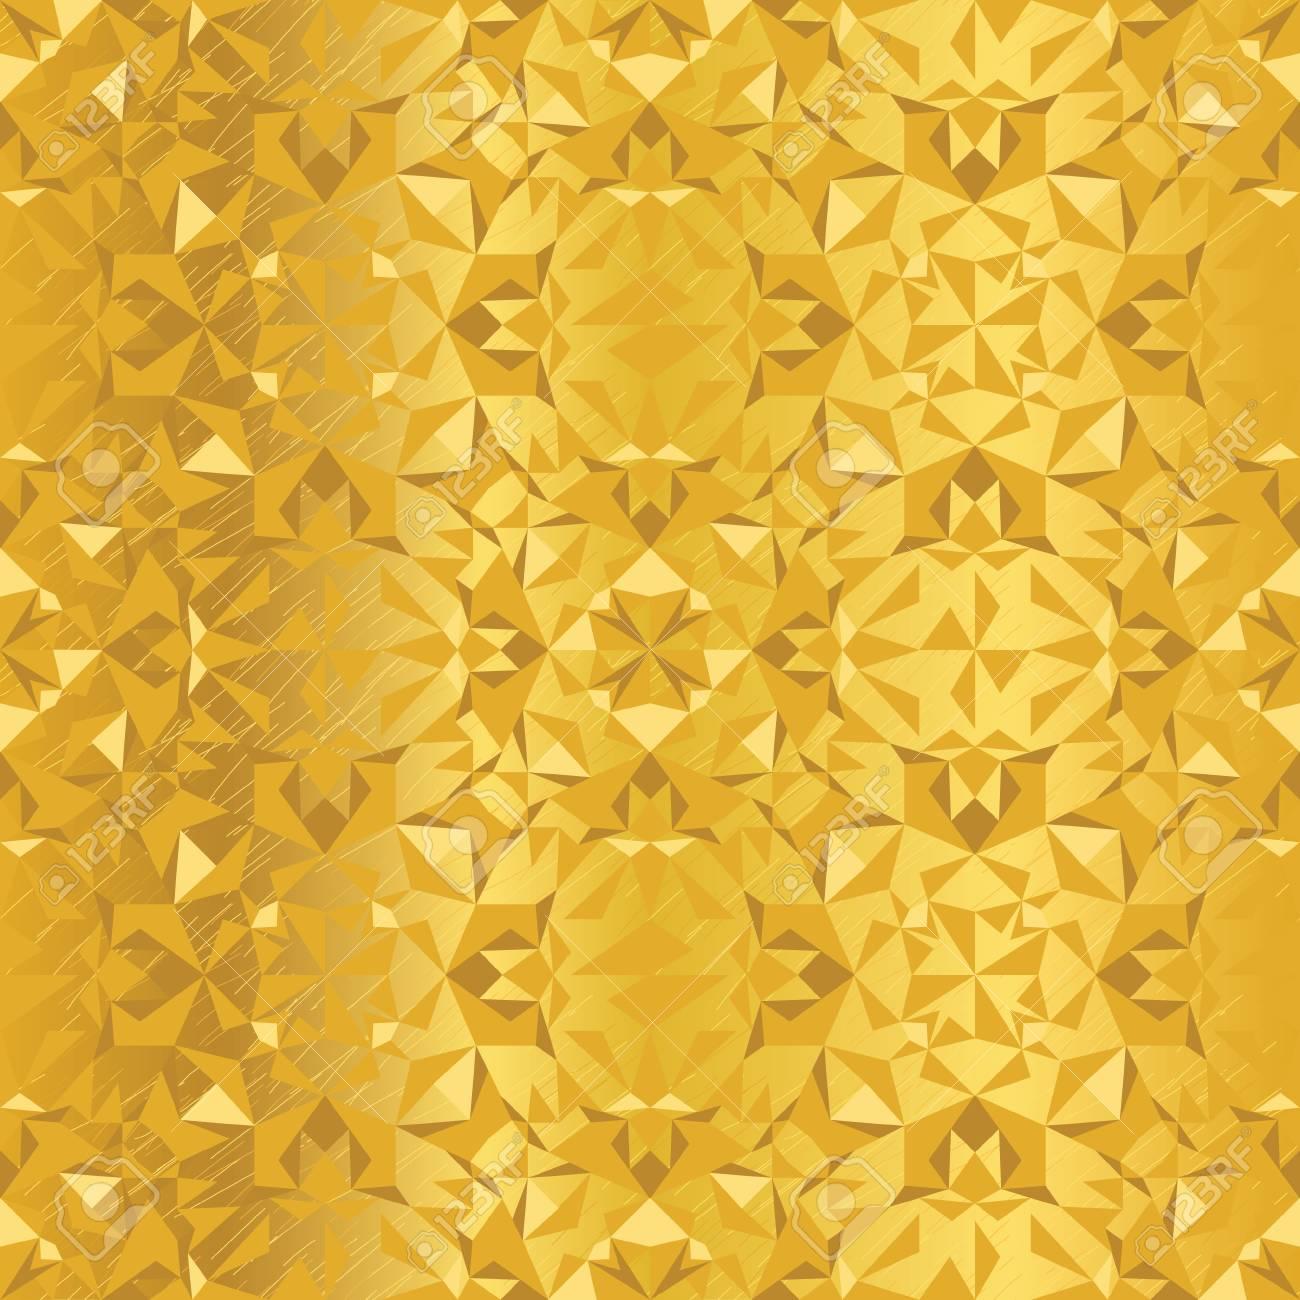 Vector Golden Foil Abstract Kaleidoscope Triangles Grunge Foil